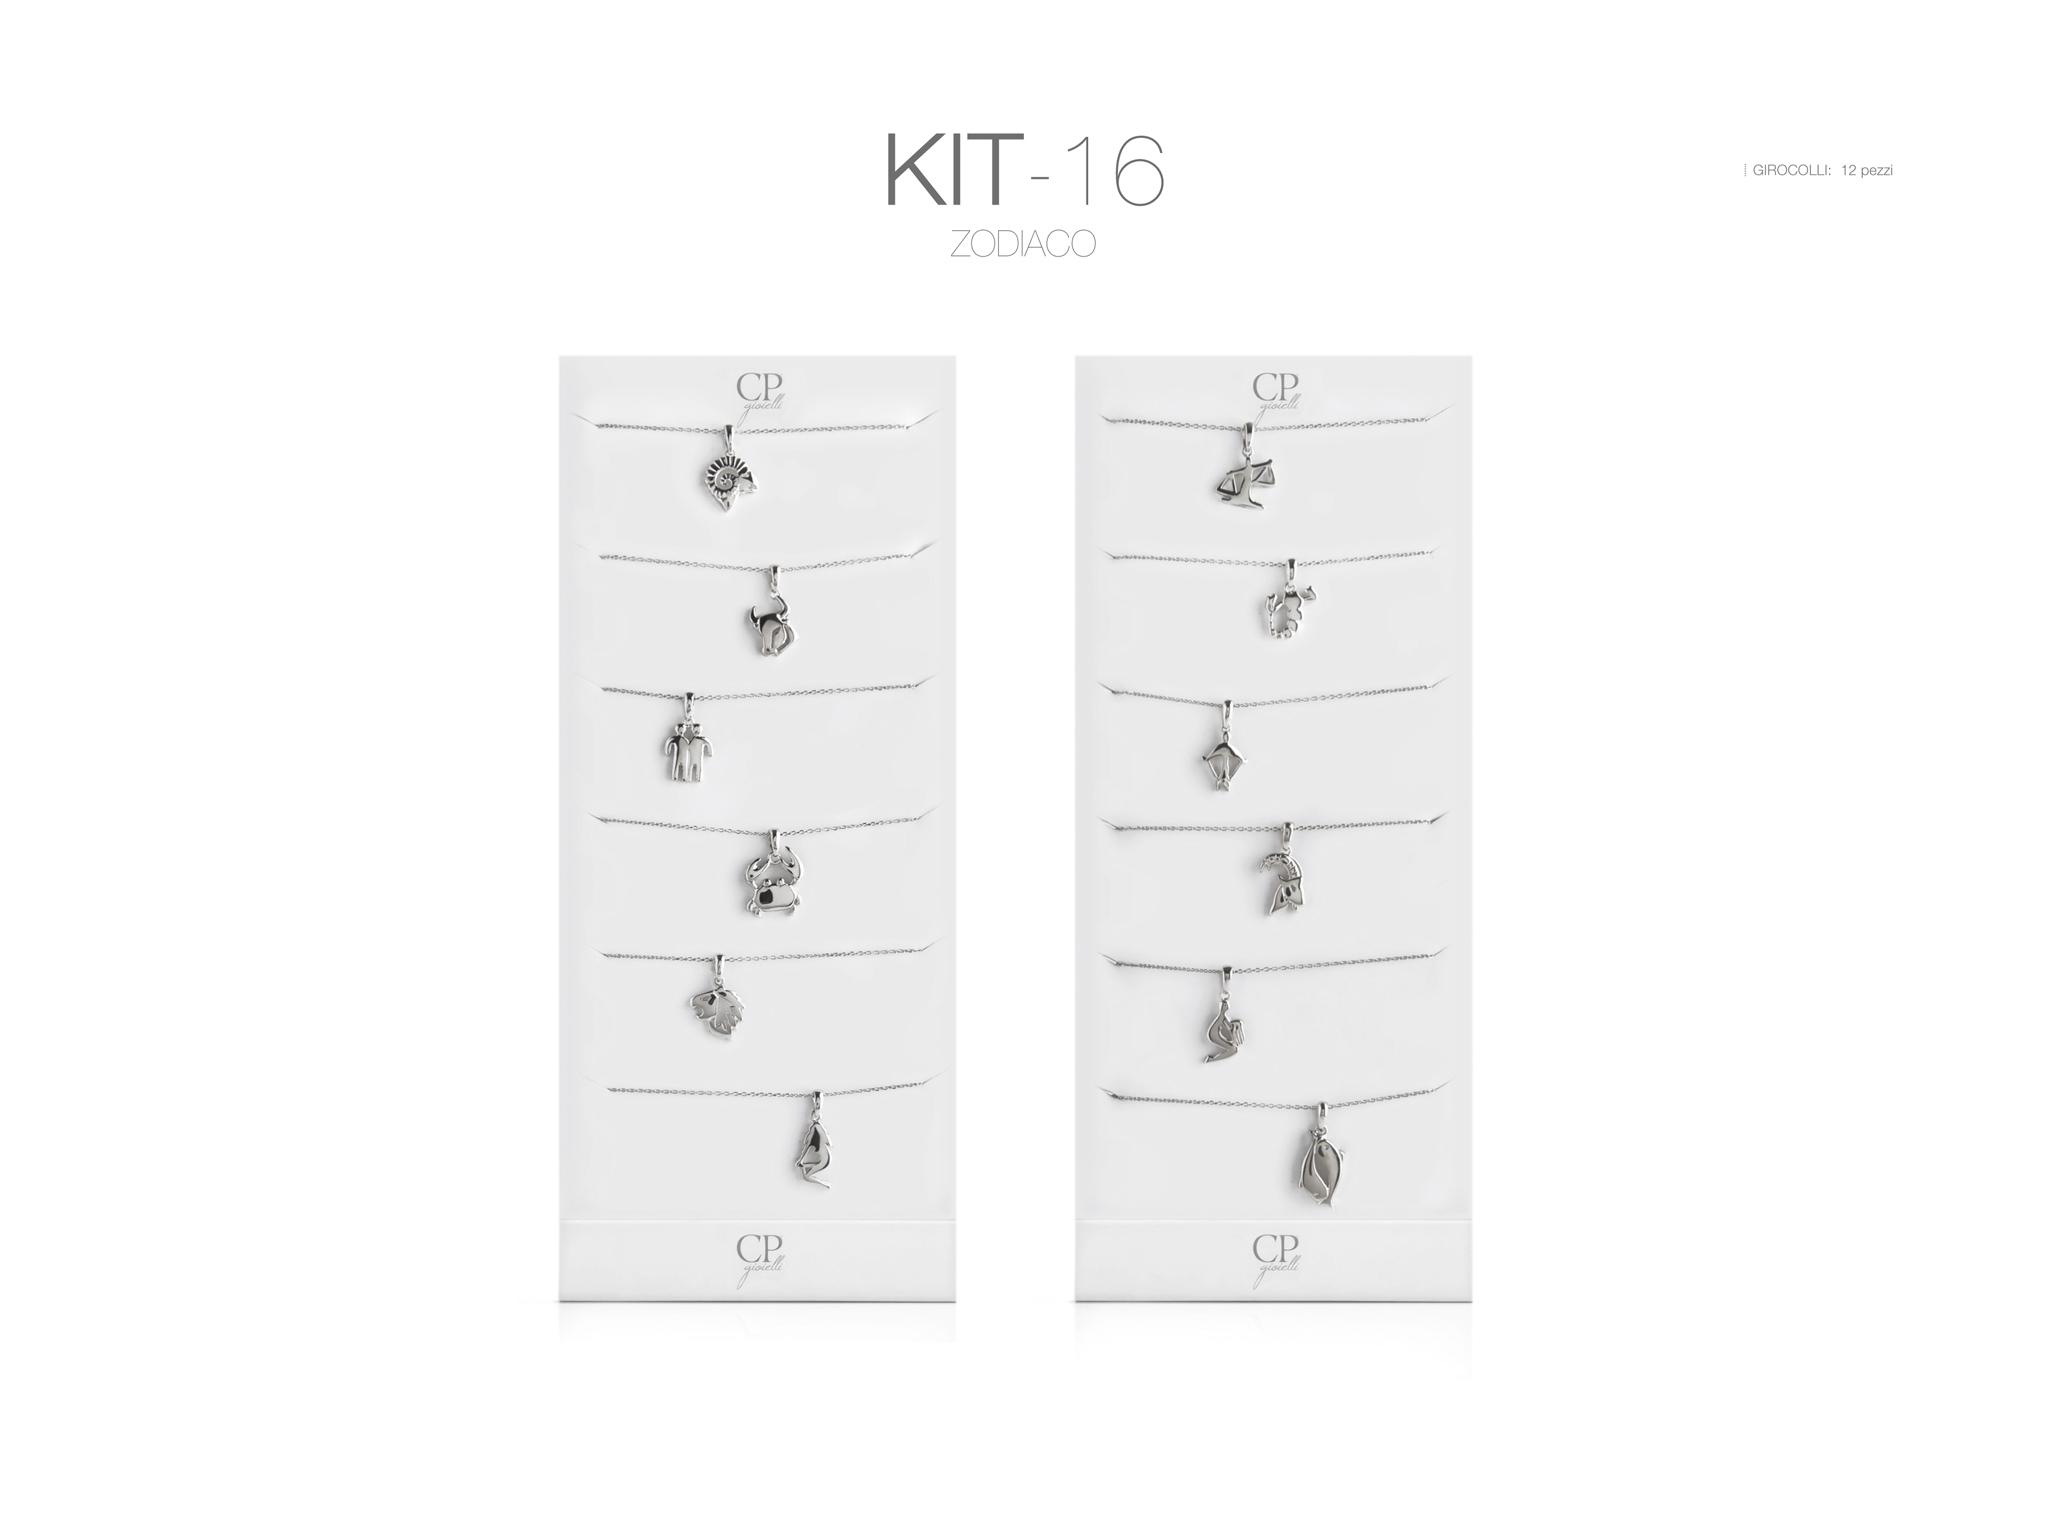 kit_argento_2-0_2016_pagina_53_app